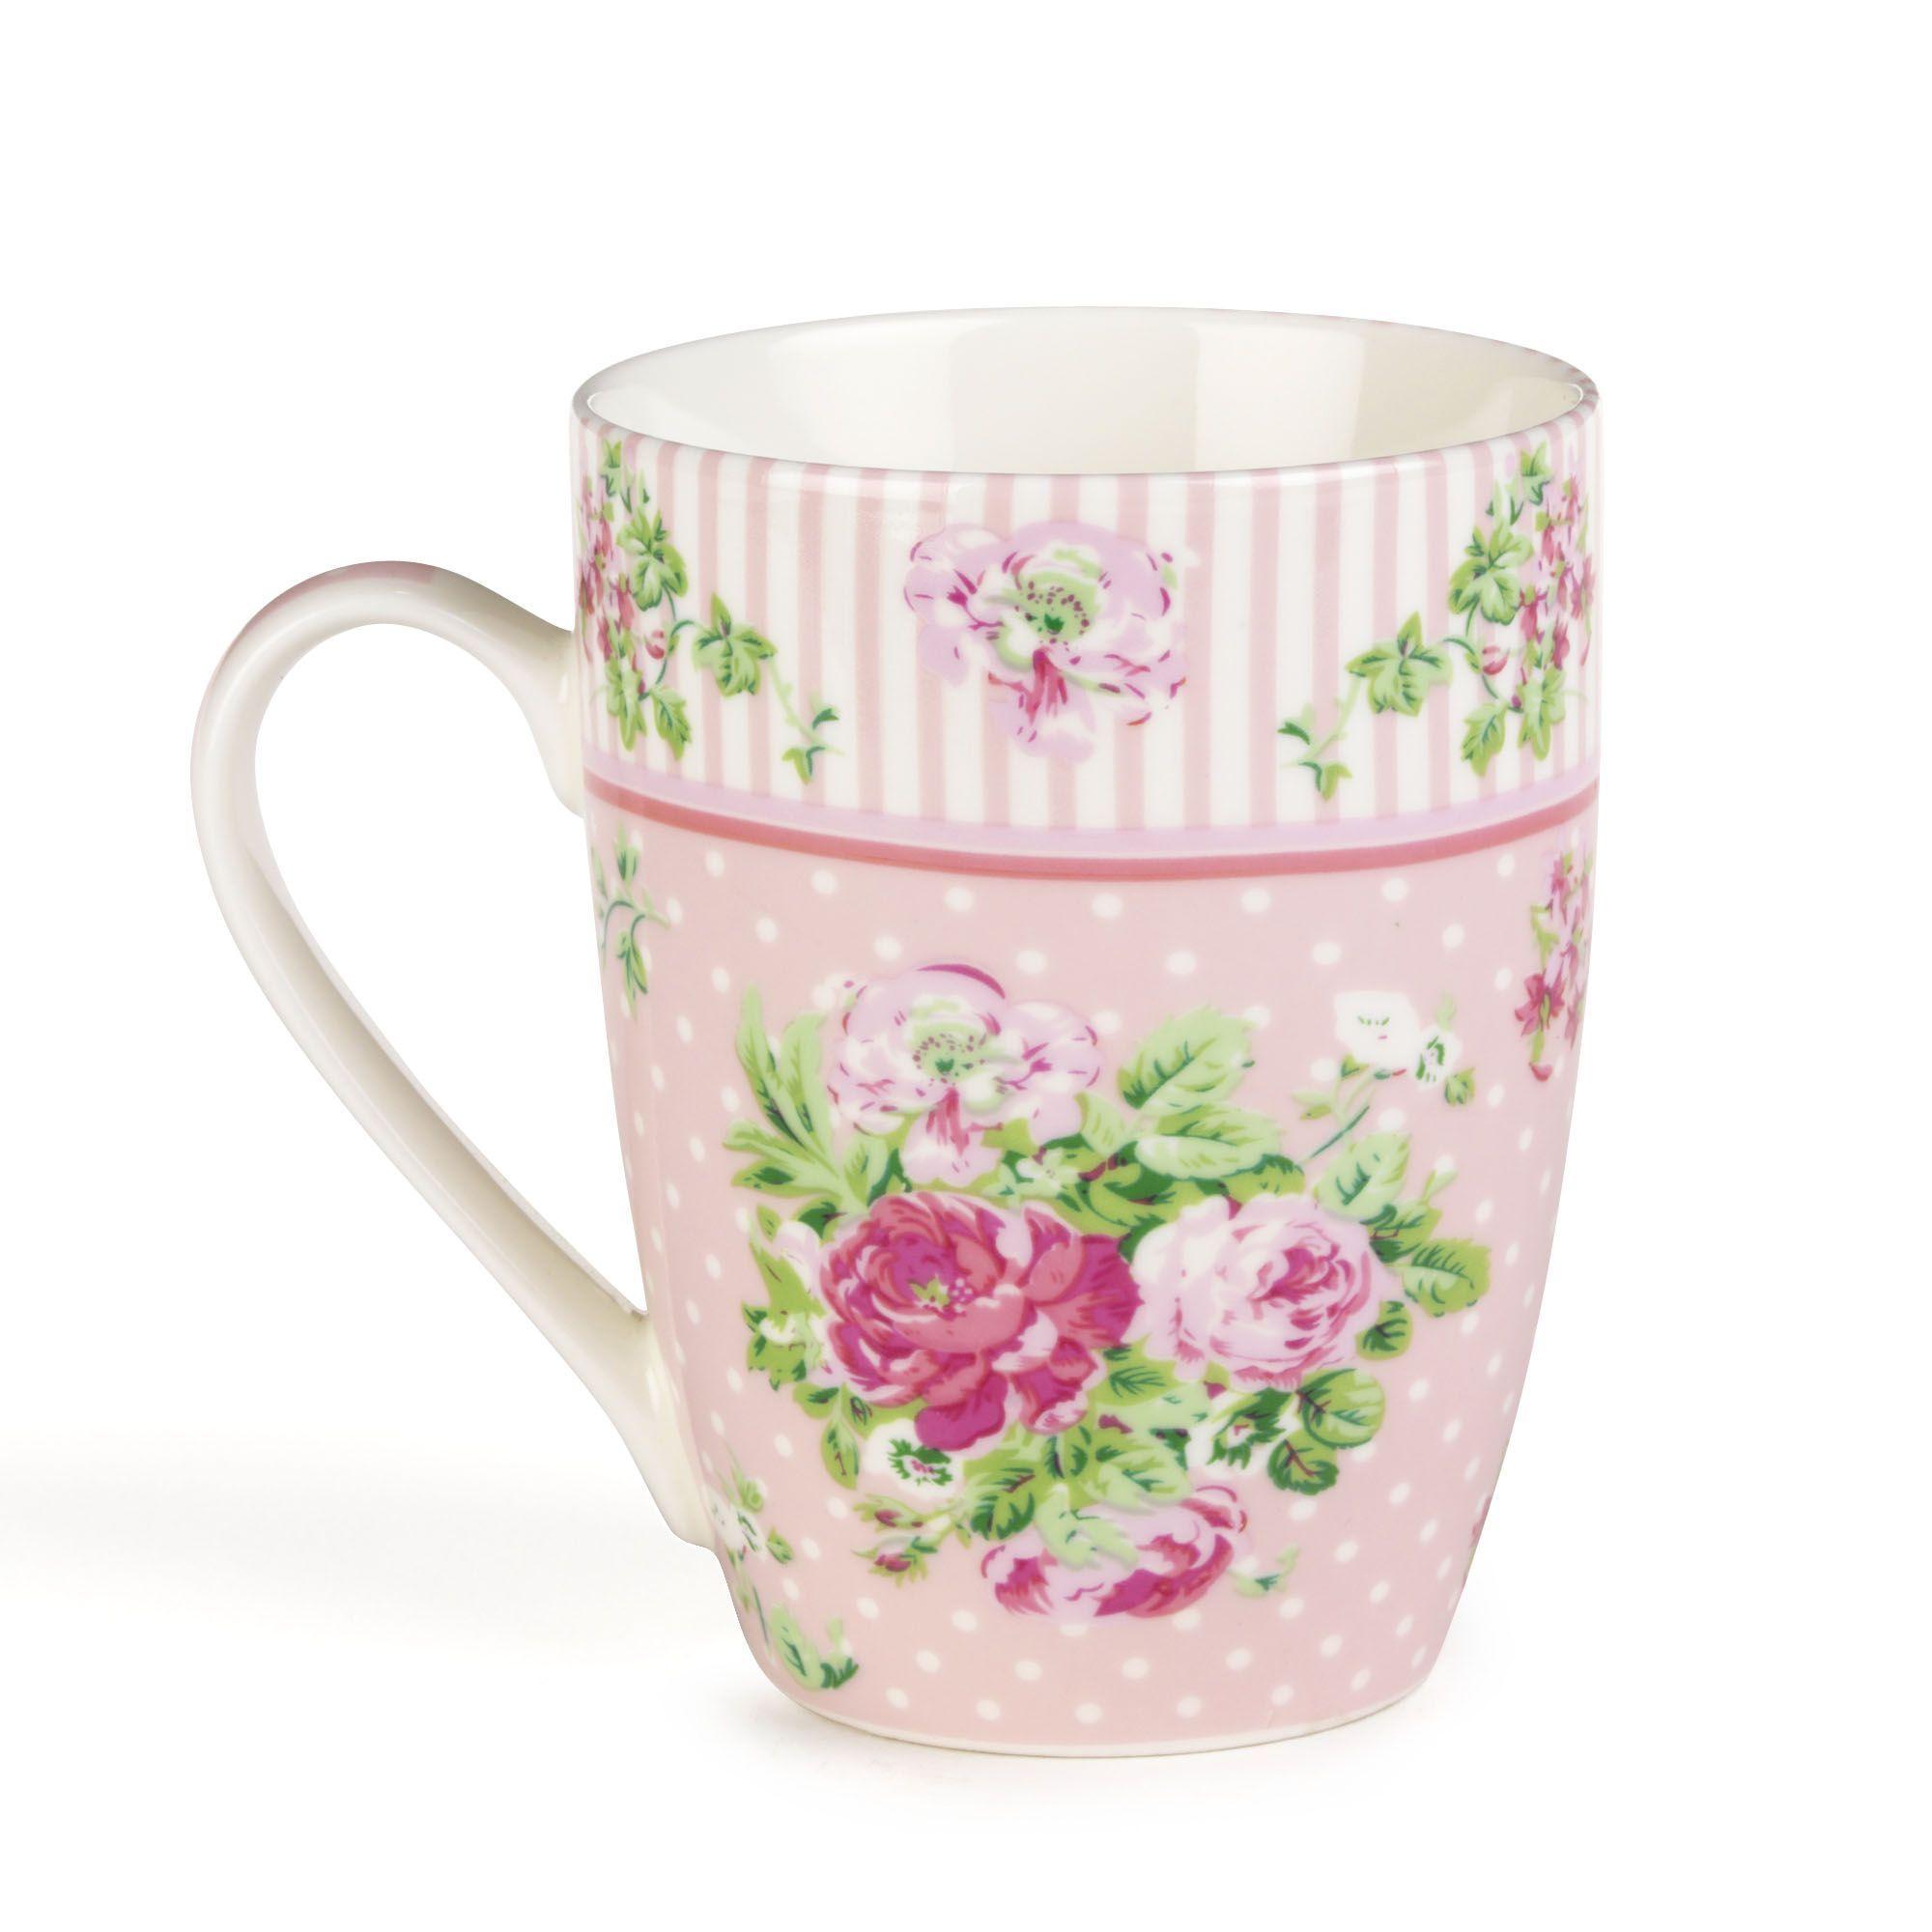 mug fleuri liberty vaisselle du petit d jeuner alinea bric brac pinterest bureaus. Black Bedroom Furniture Sets. Home Design Ideas